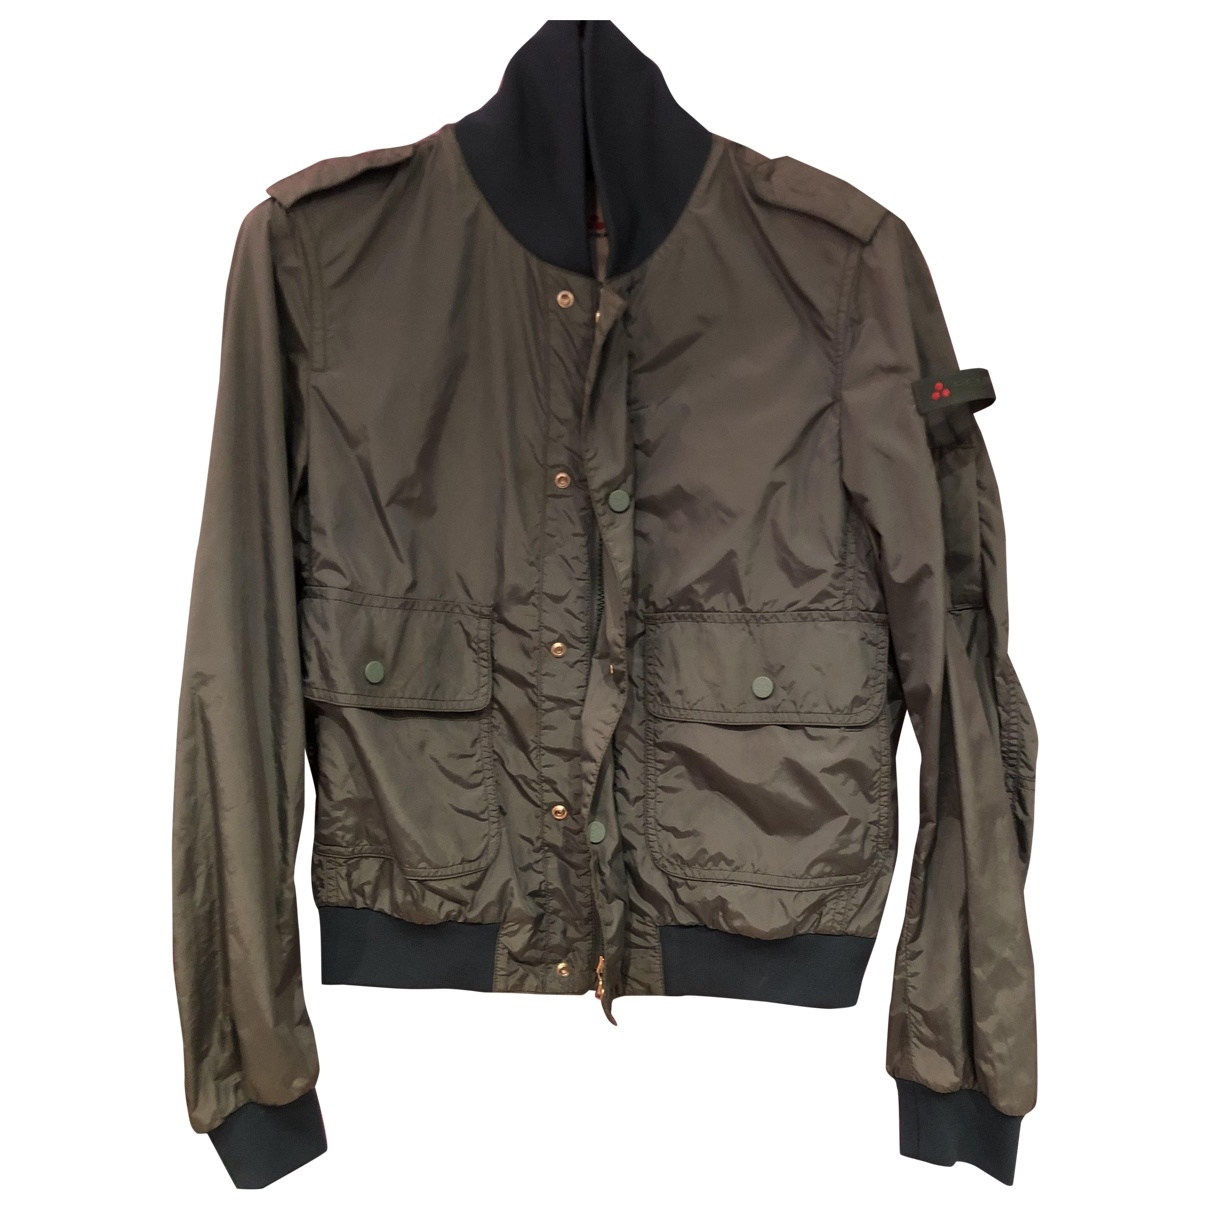 Peuterey \N Green jacket & coat for Kids 12 years - XS UK